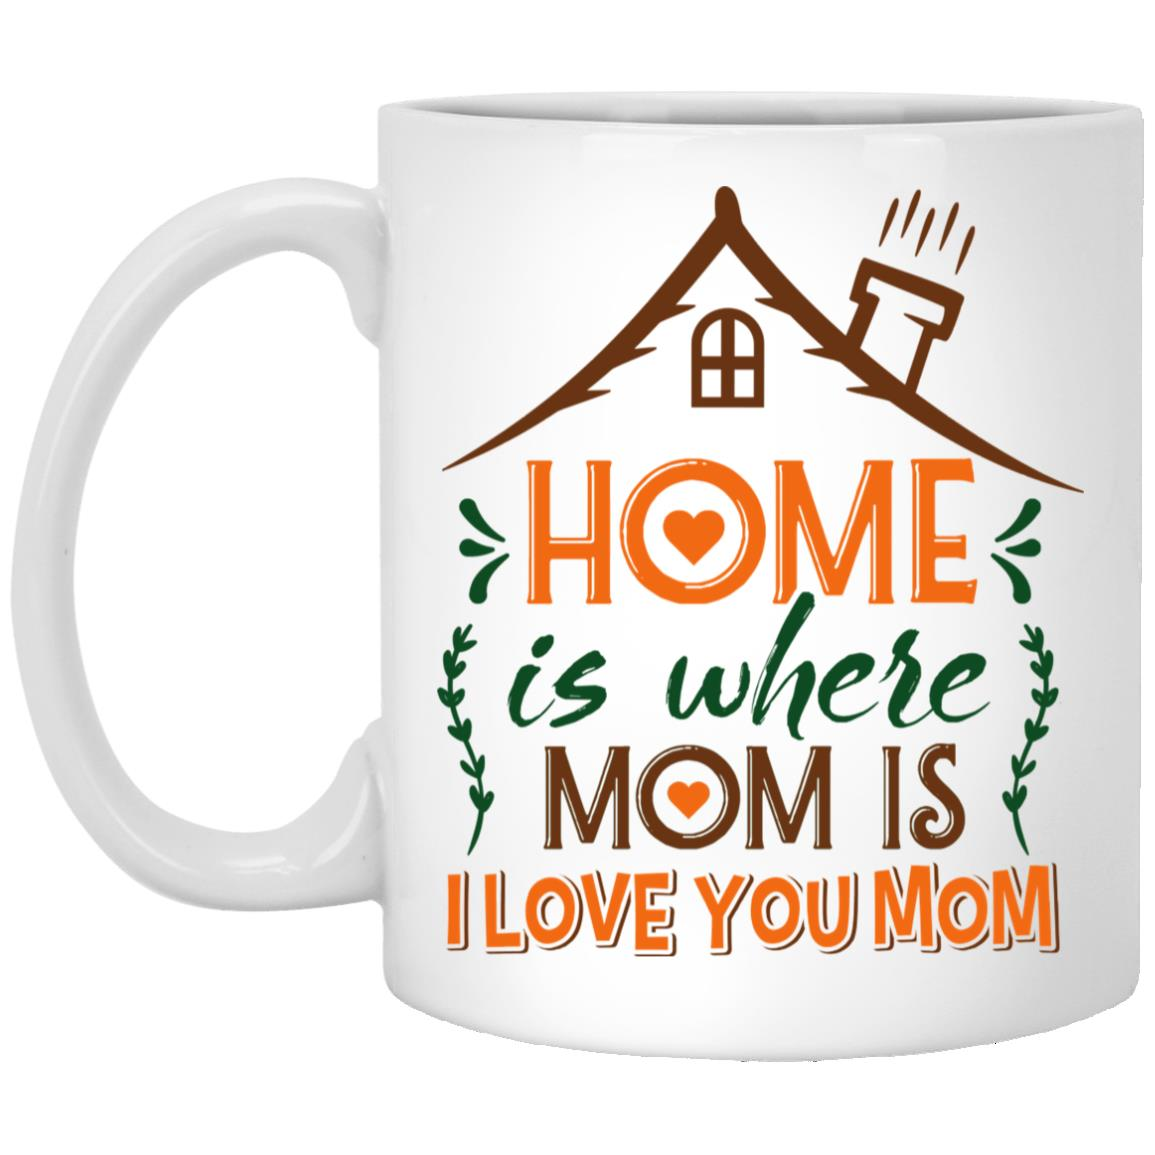 Home Is Where Mom Is I Love You Mom Ceramic Mug